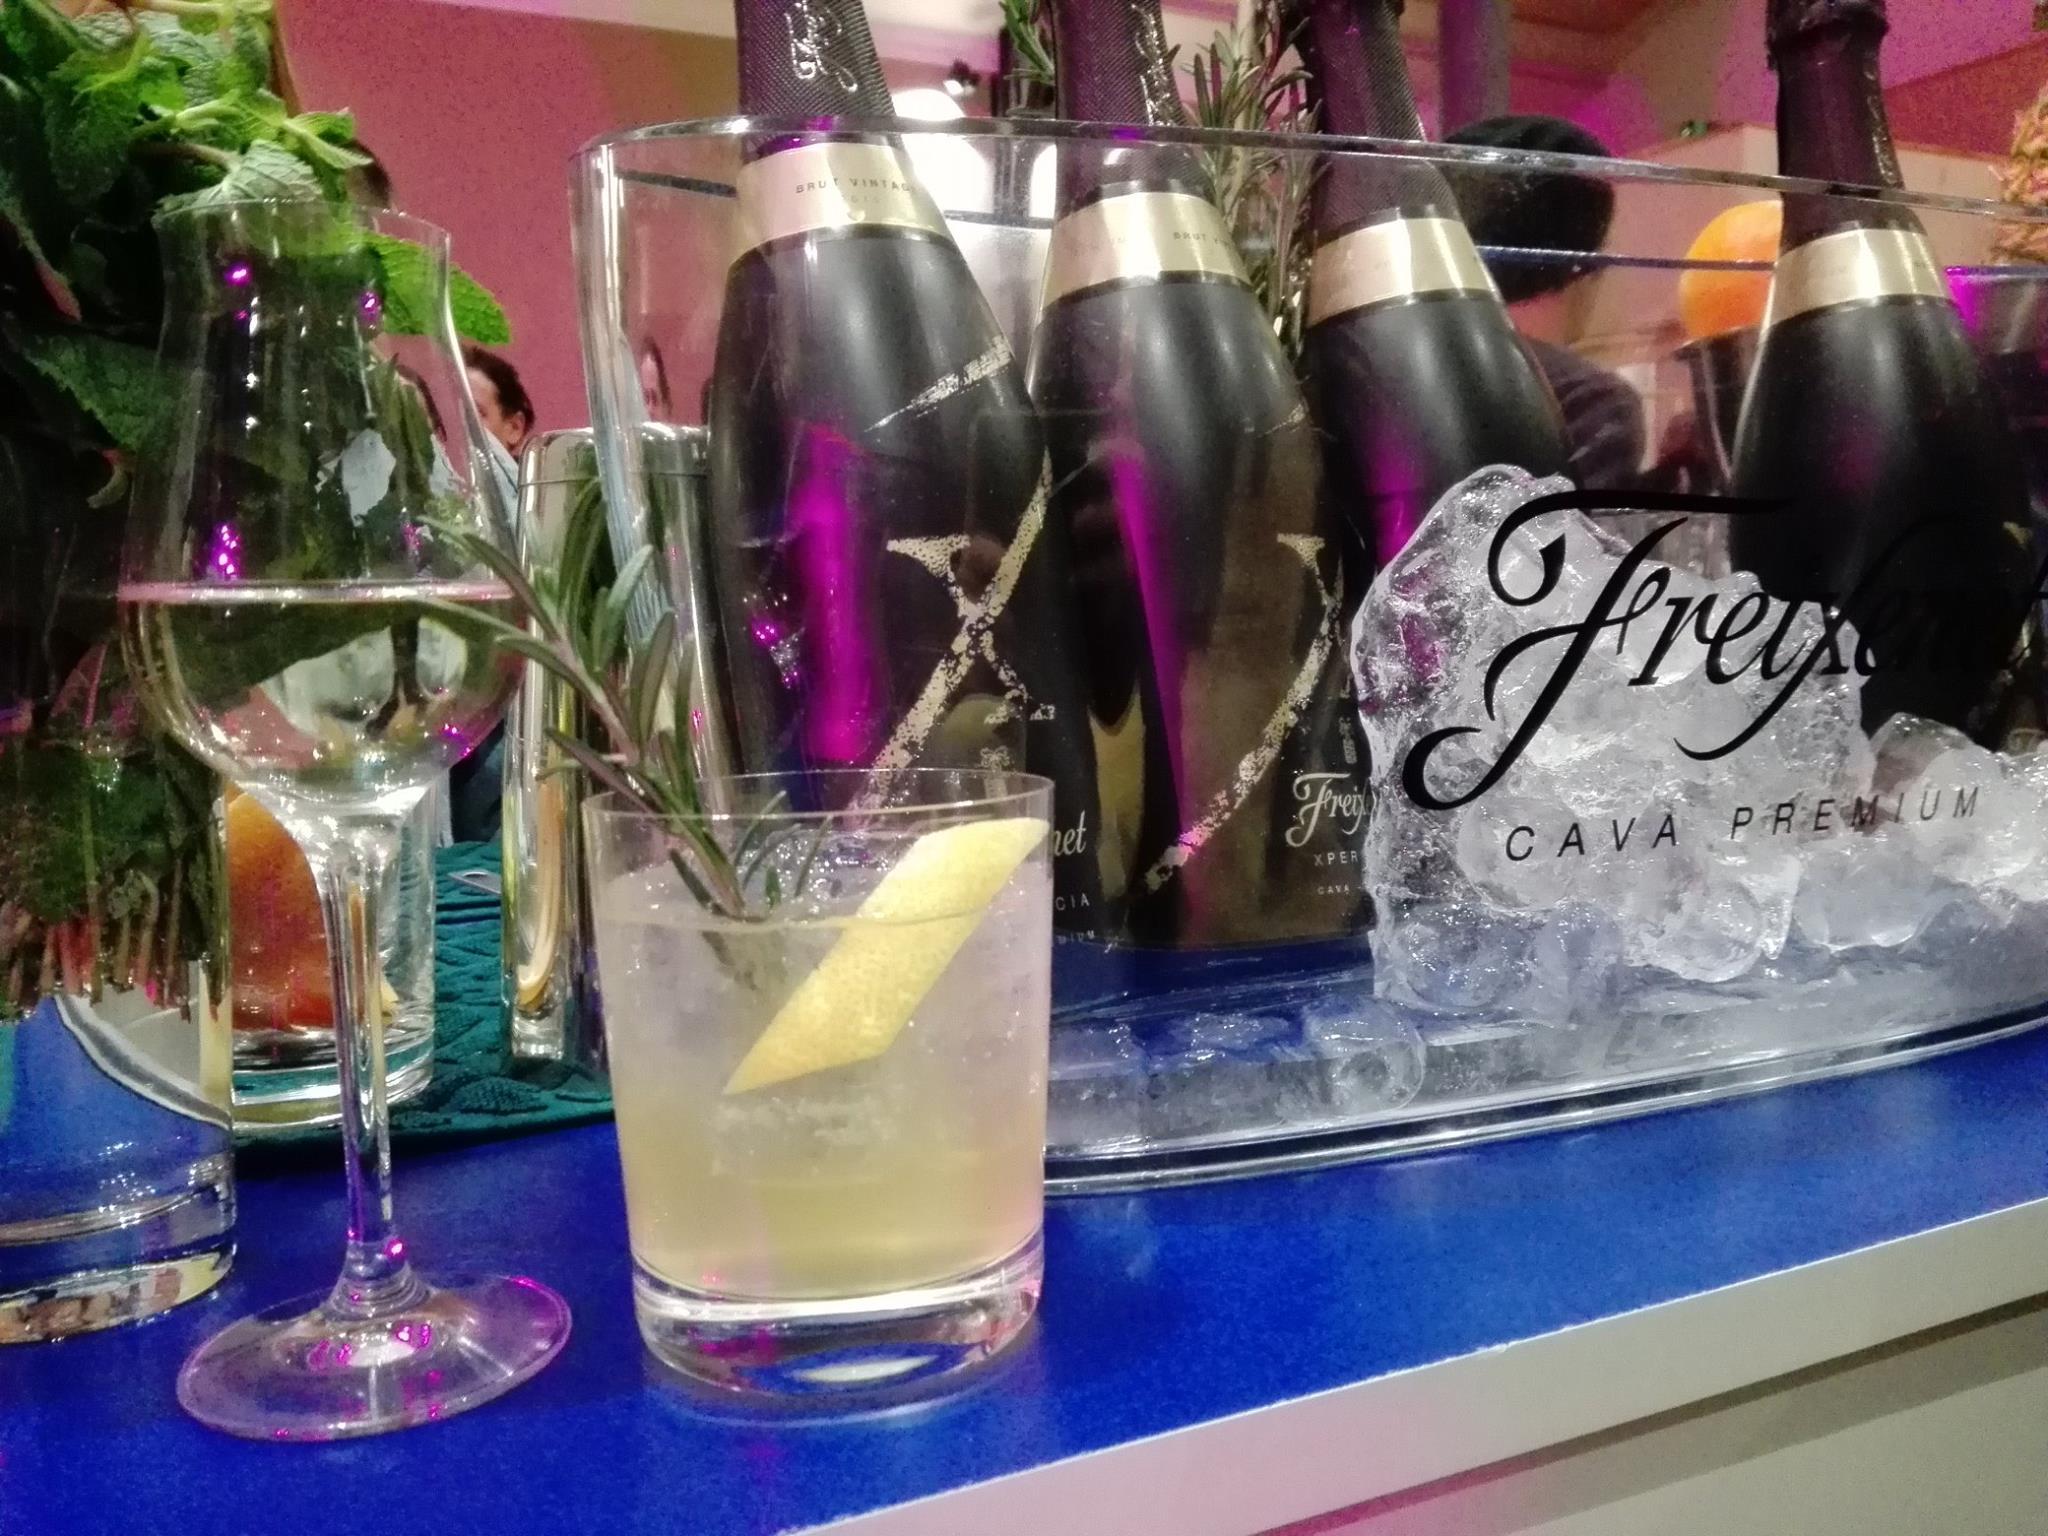 Cocktail Barcelona Mule - Freixenet